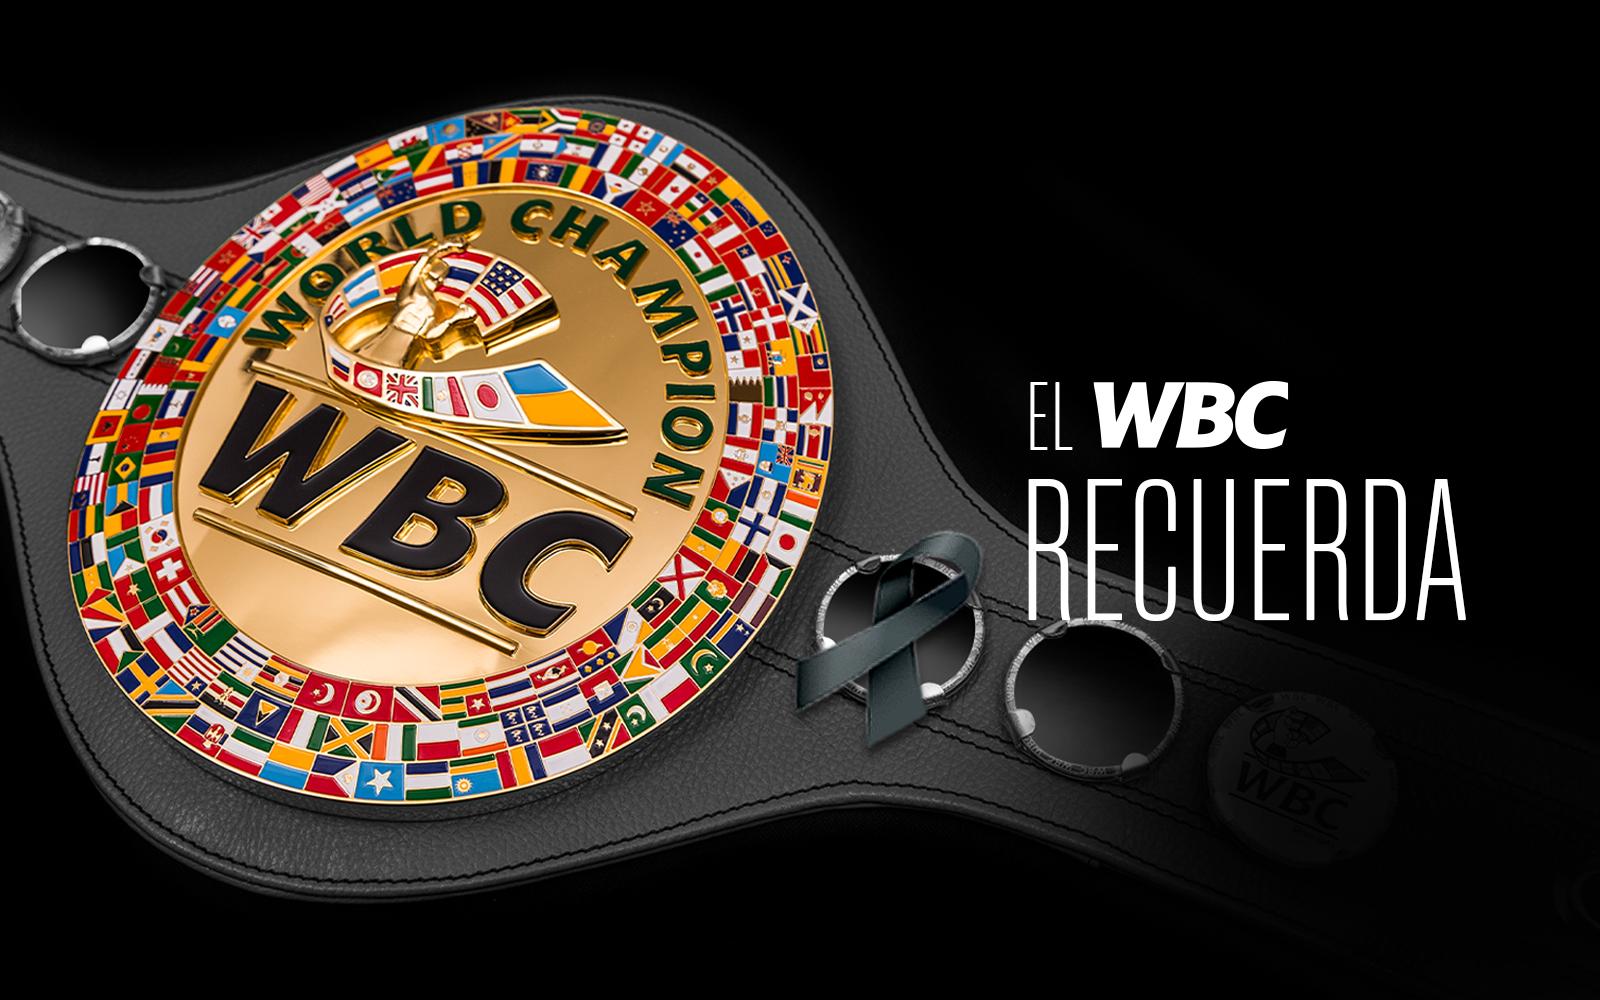 https://wbcboxing.com/wp-content/uploads/20200826_wbc_web_recuerda_boxeo.jpg